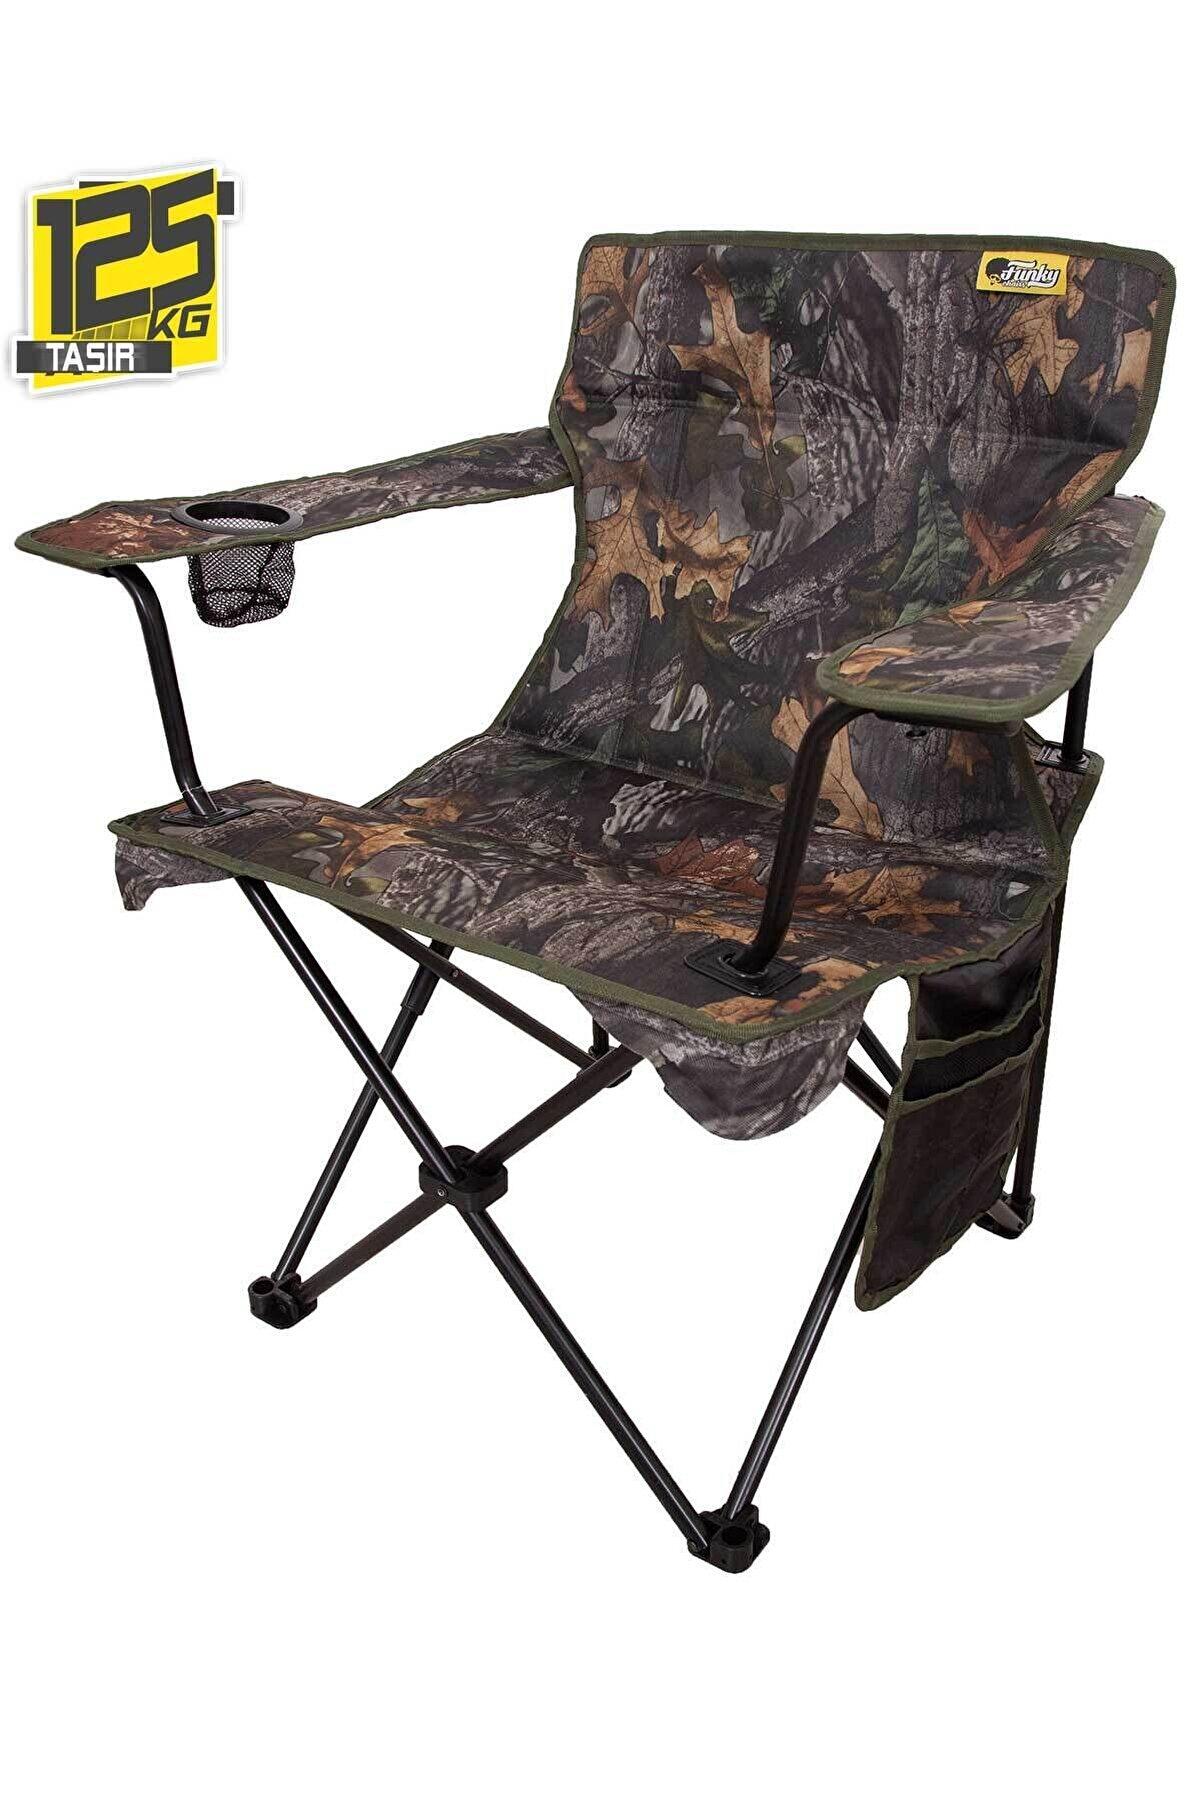 Funky Chairs Funky Chaırs V2 Meşe Kamuflaj Lüks Kamp Sandalyesi